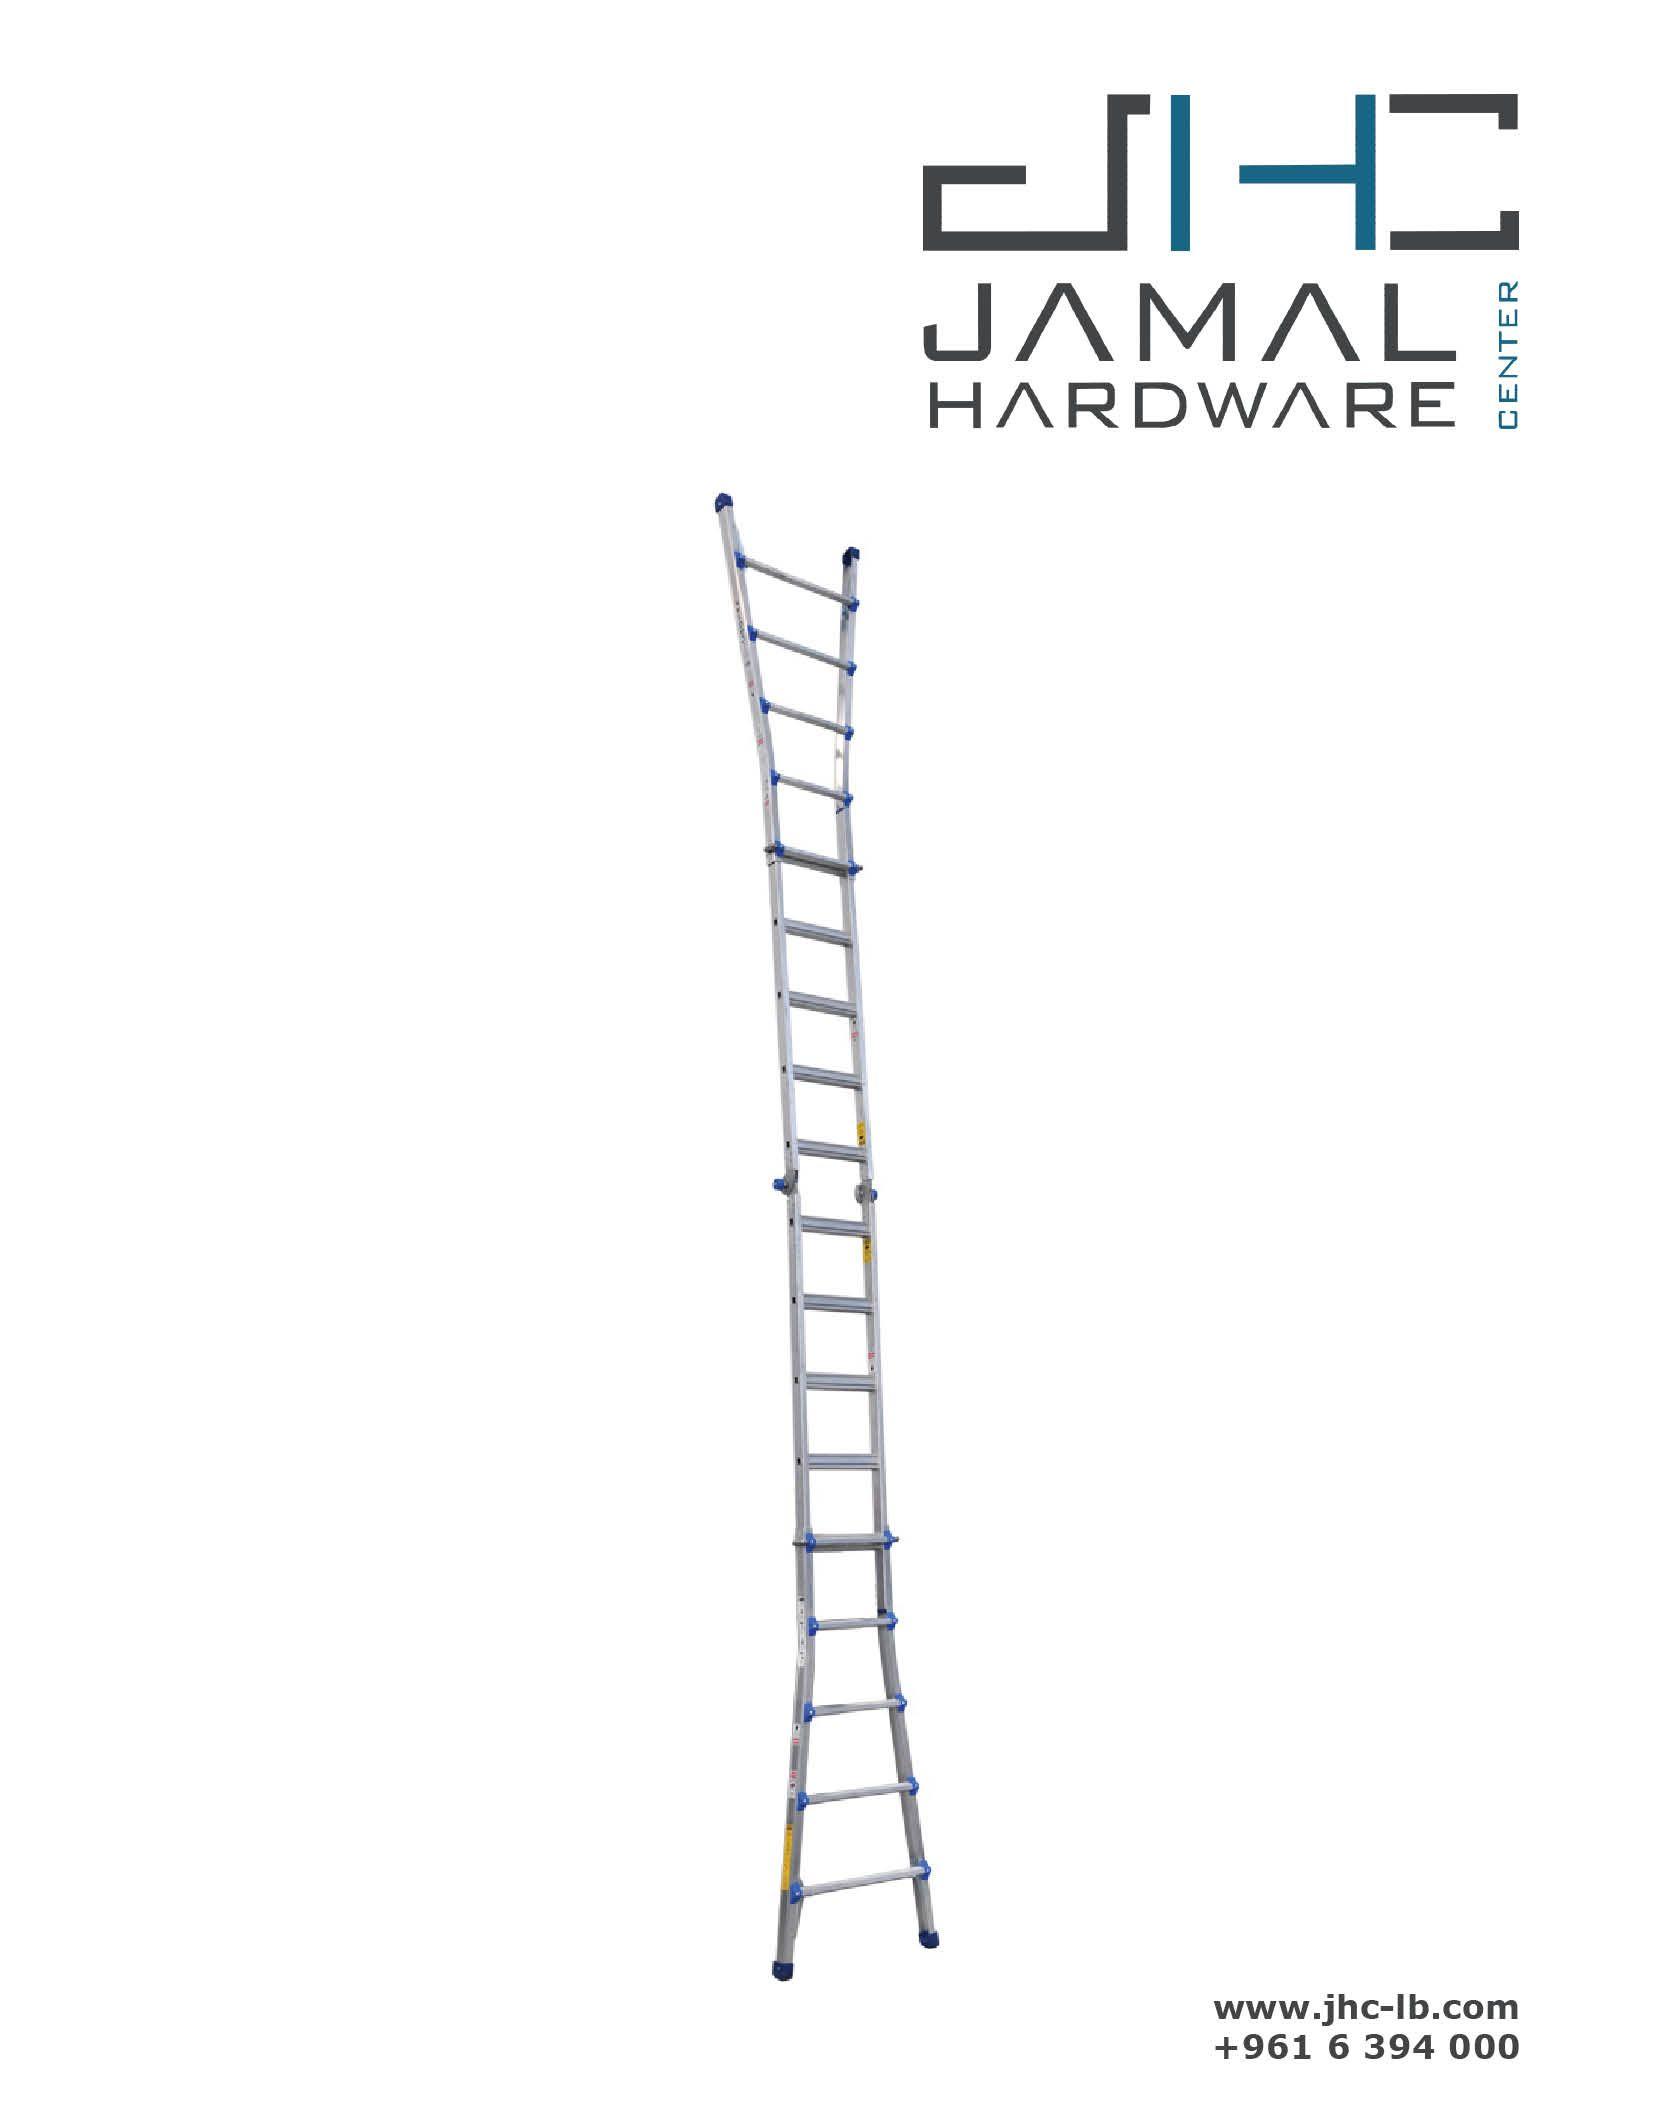 Best Pin By Jamal Hardware Center On Multipurpose Aluminium 400 x 300